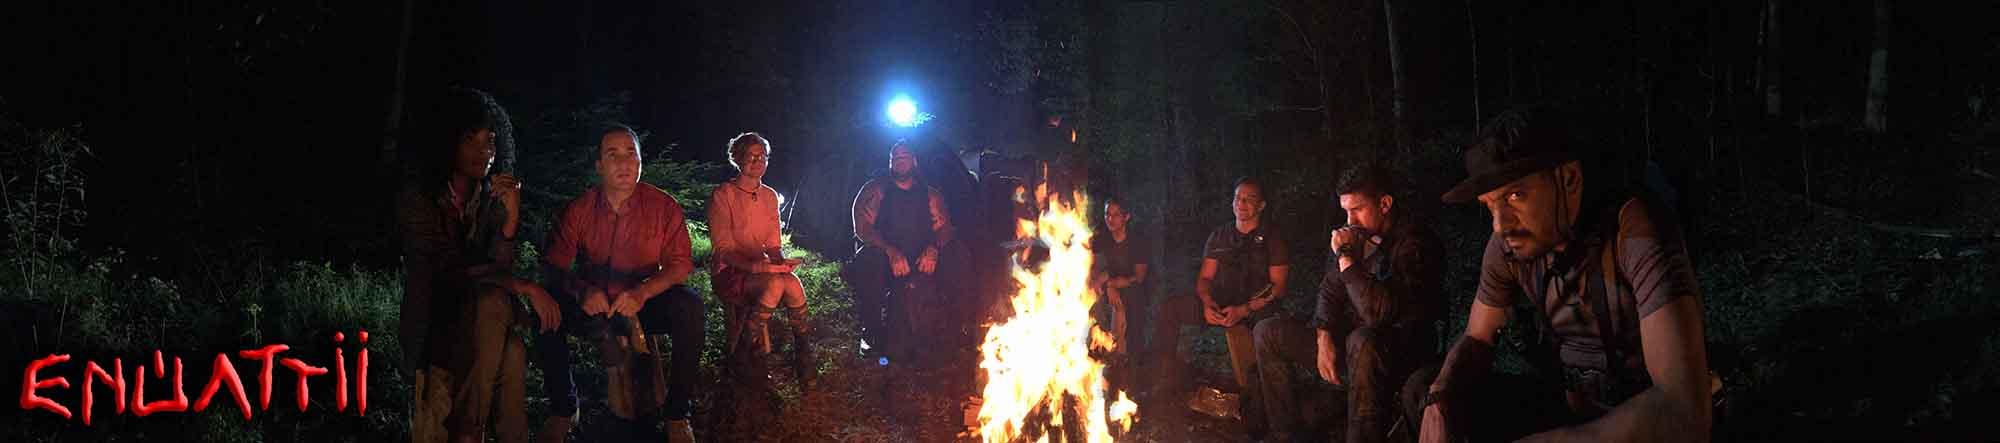 enuaiitt-group-fire-pano